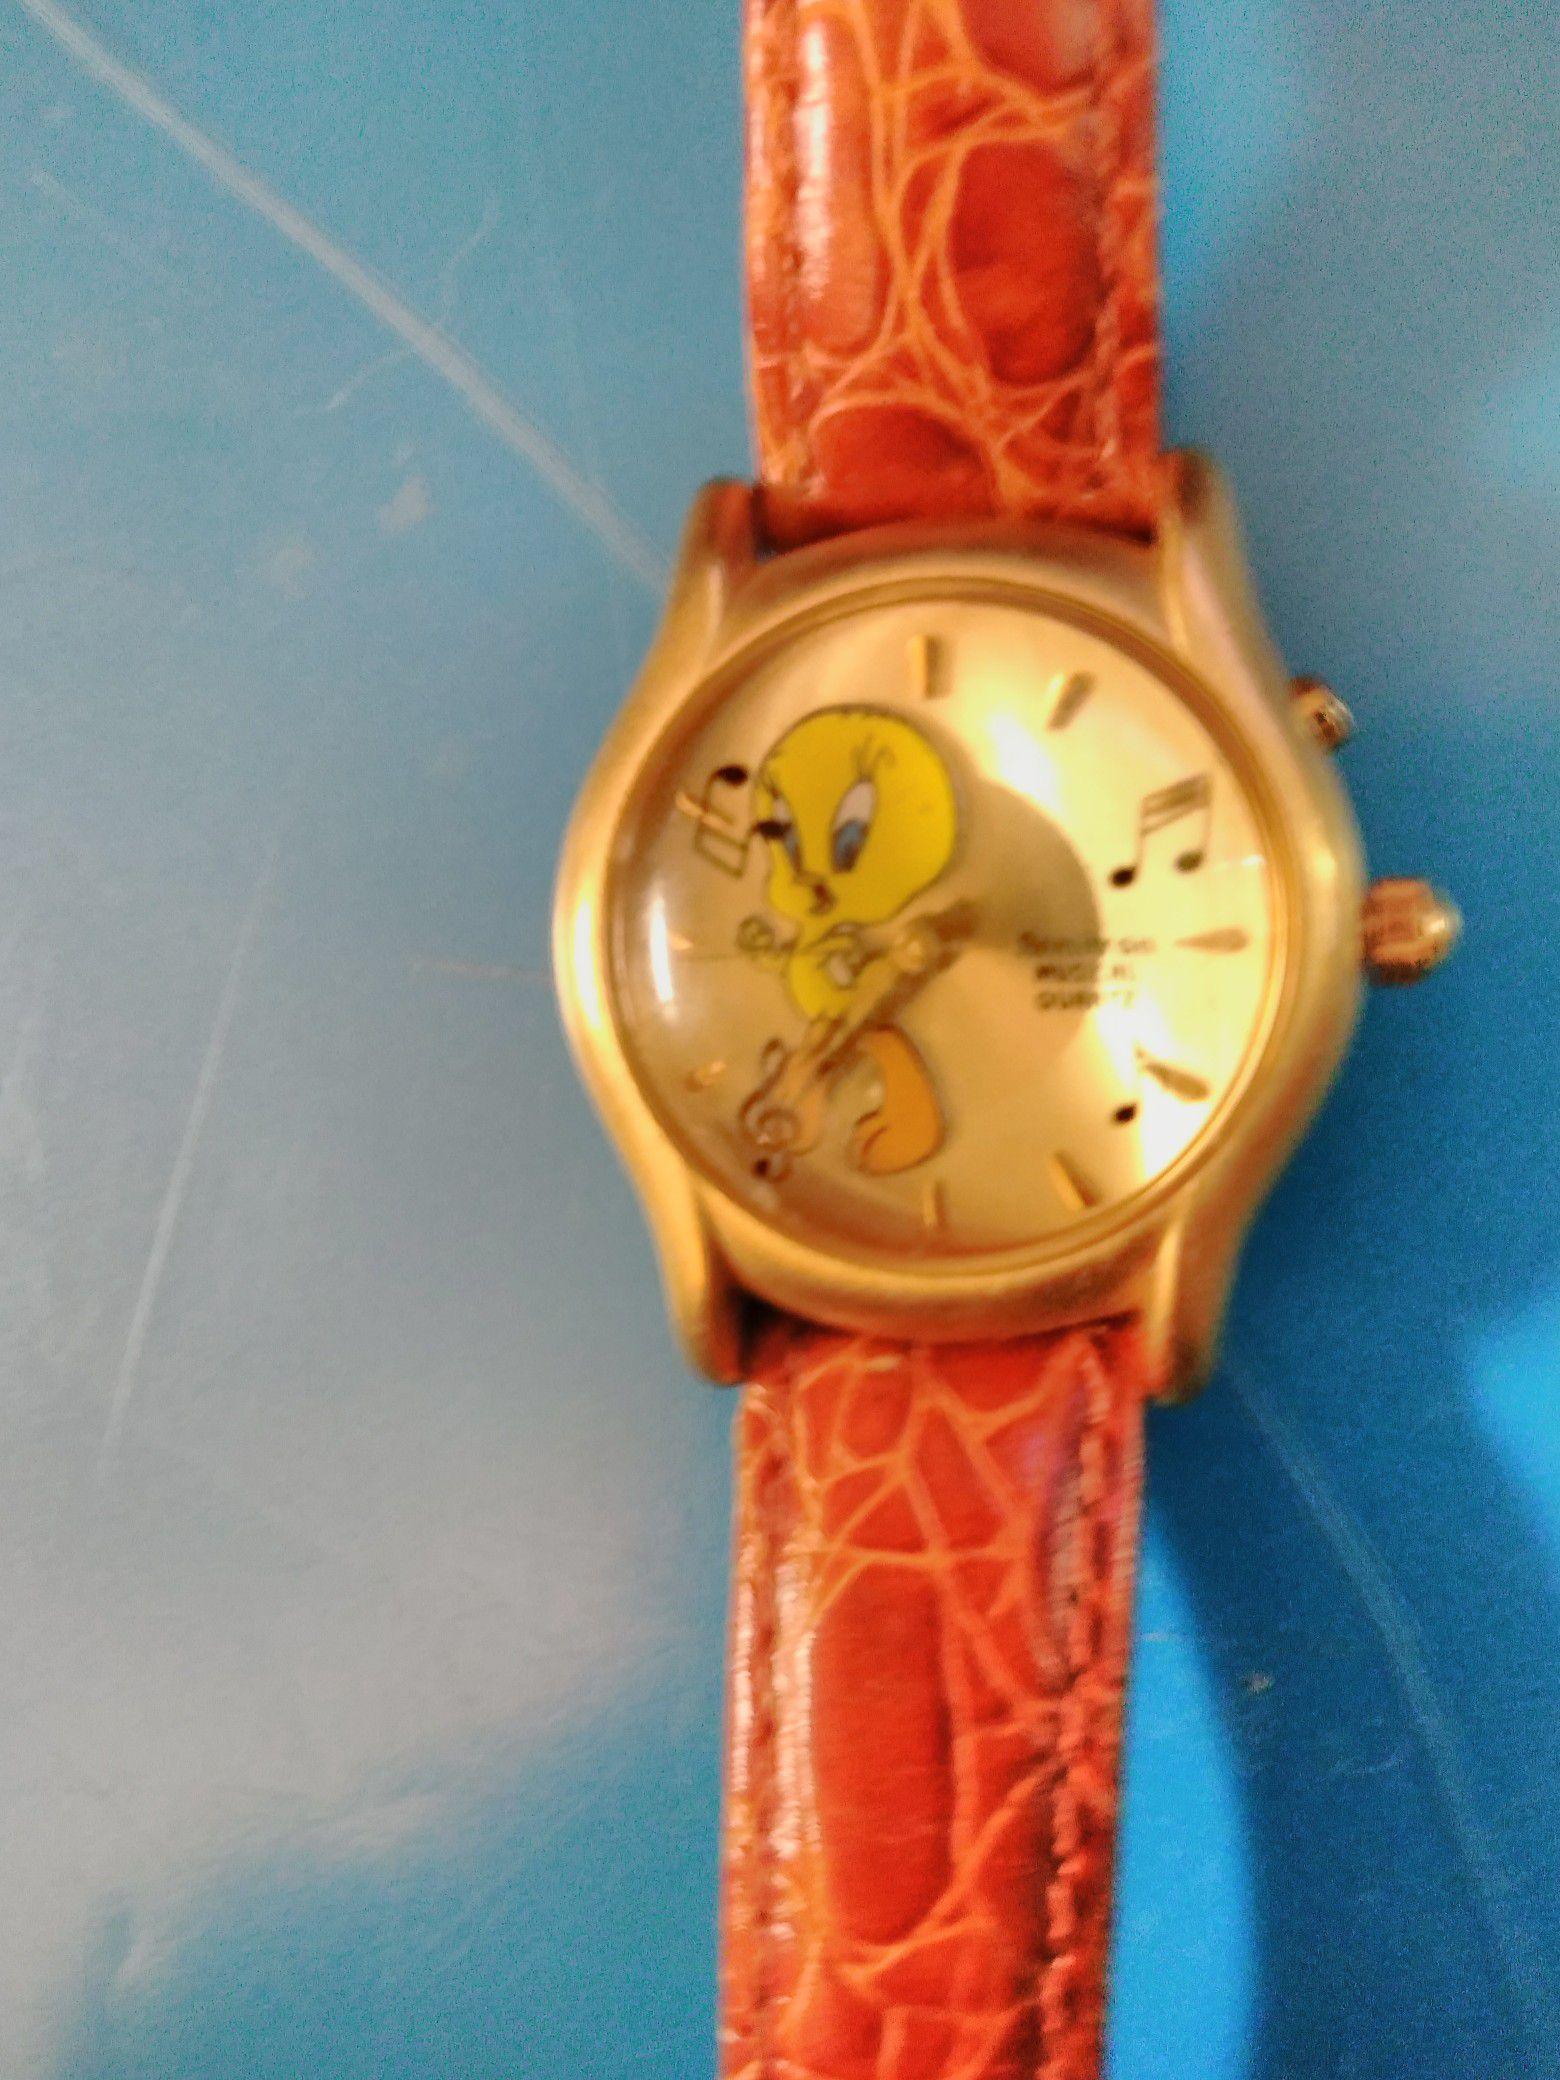 Rare musical Tweety Bird watch